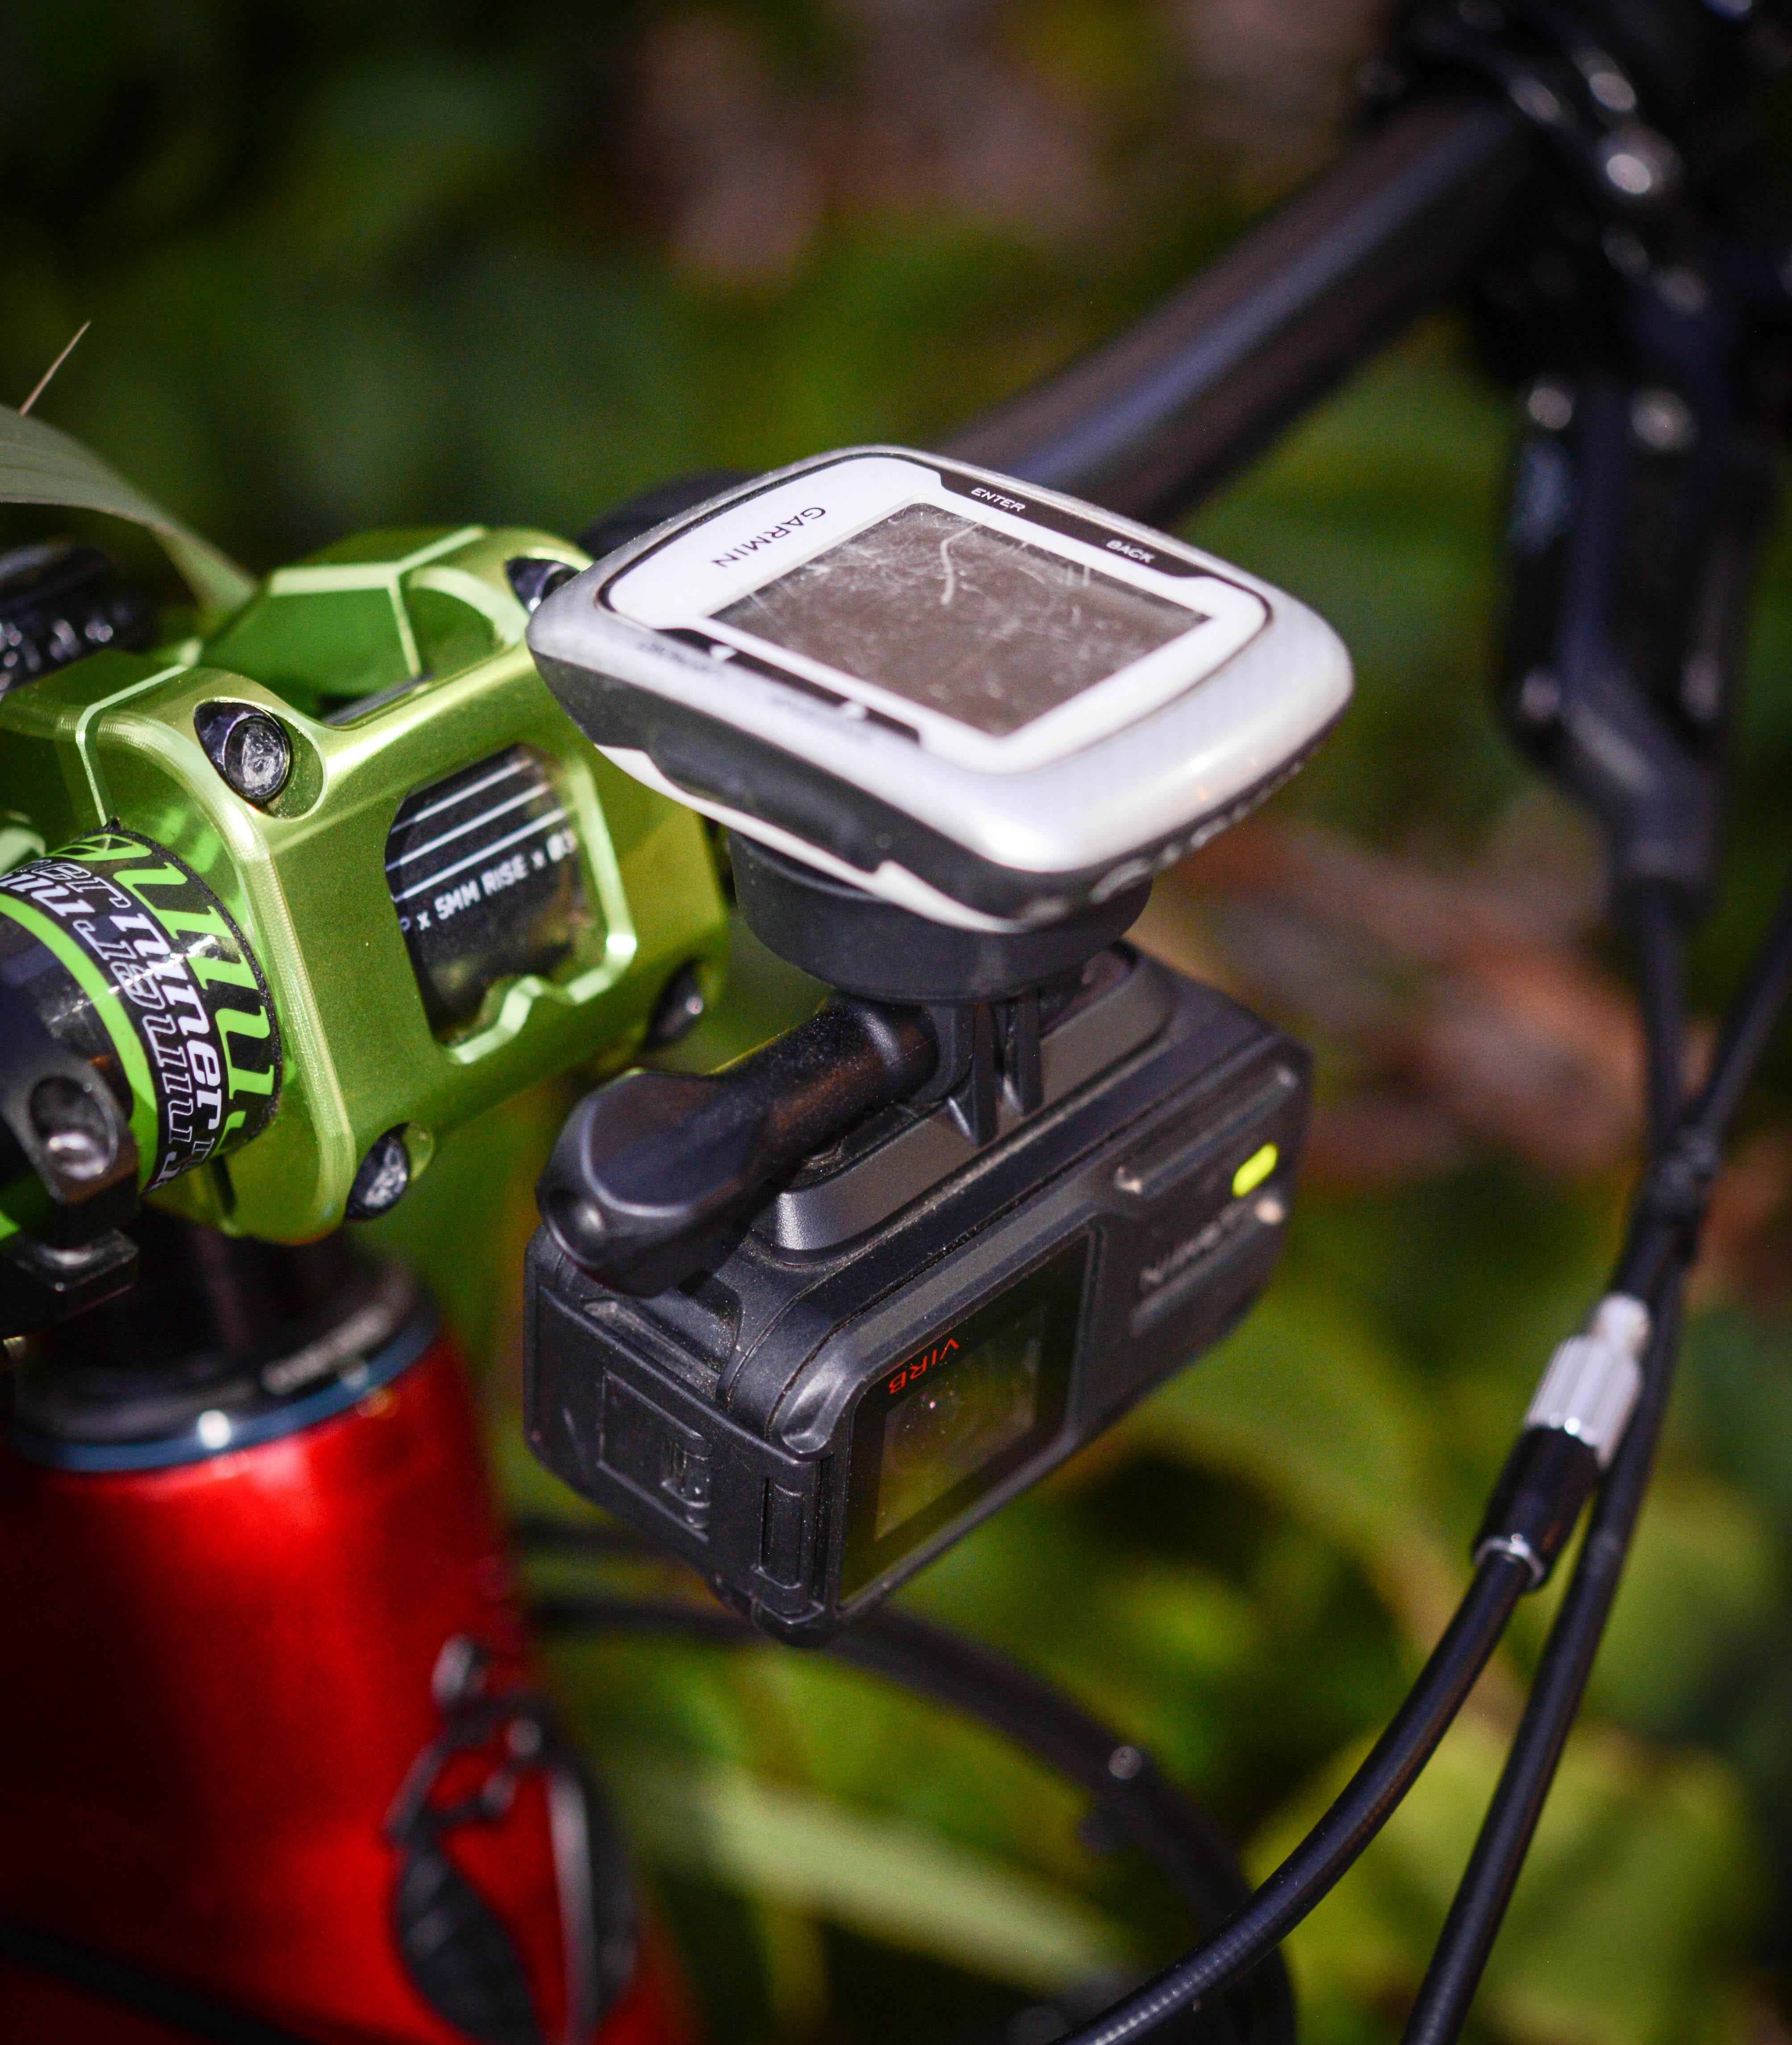 garmin combo mount review singletracks mountain bike news. Black Bedroom Furniture Sets. Home Design Ideas